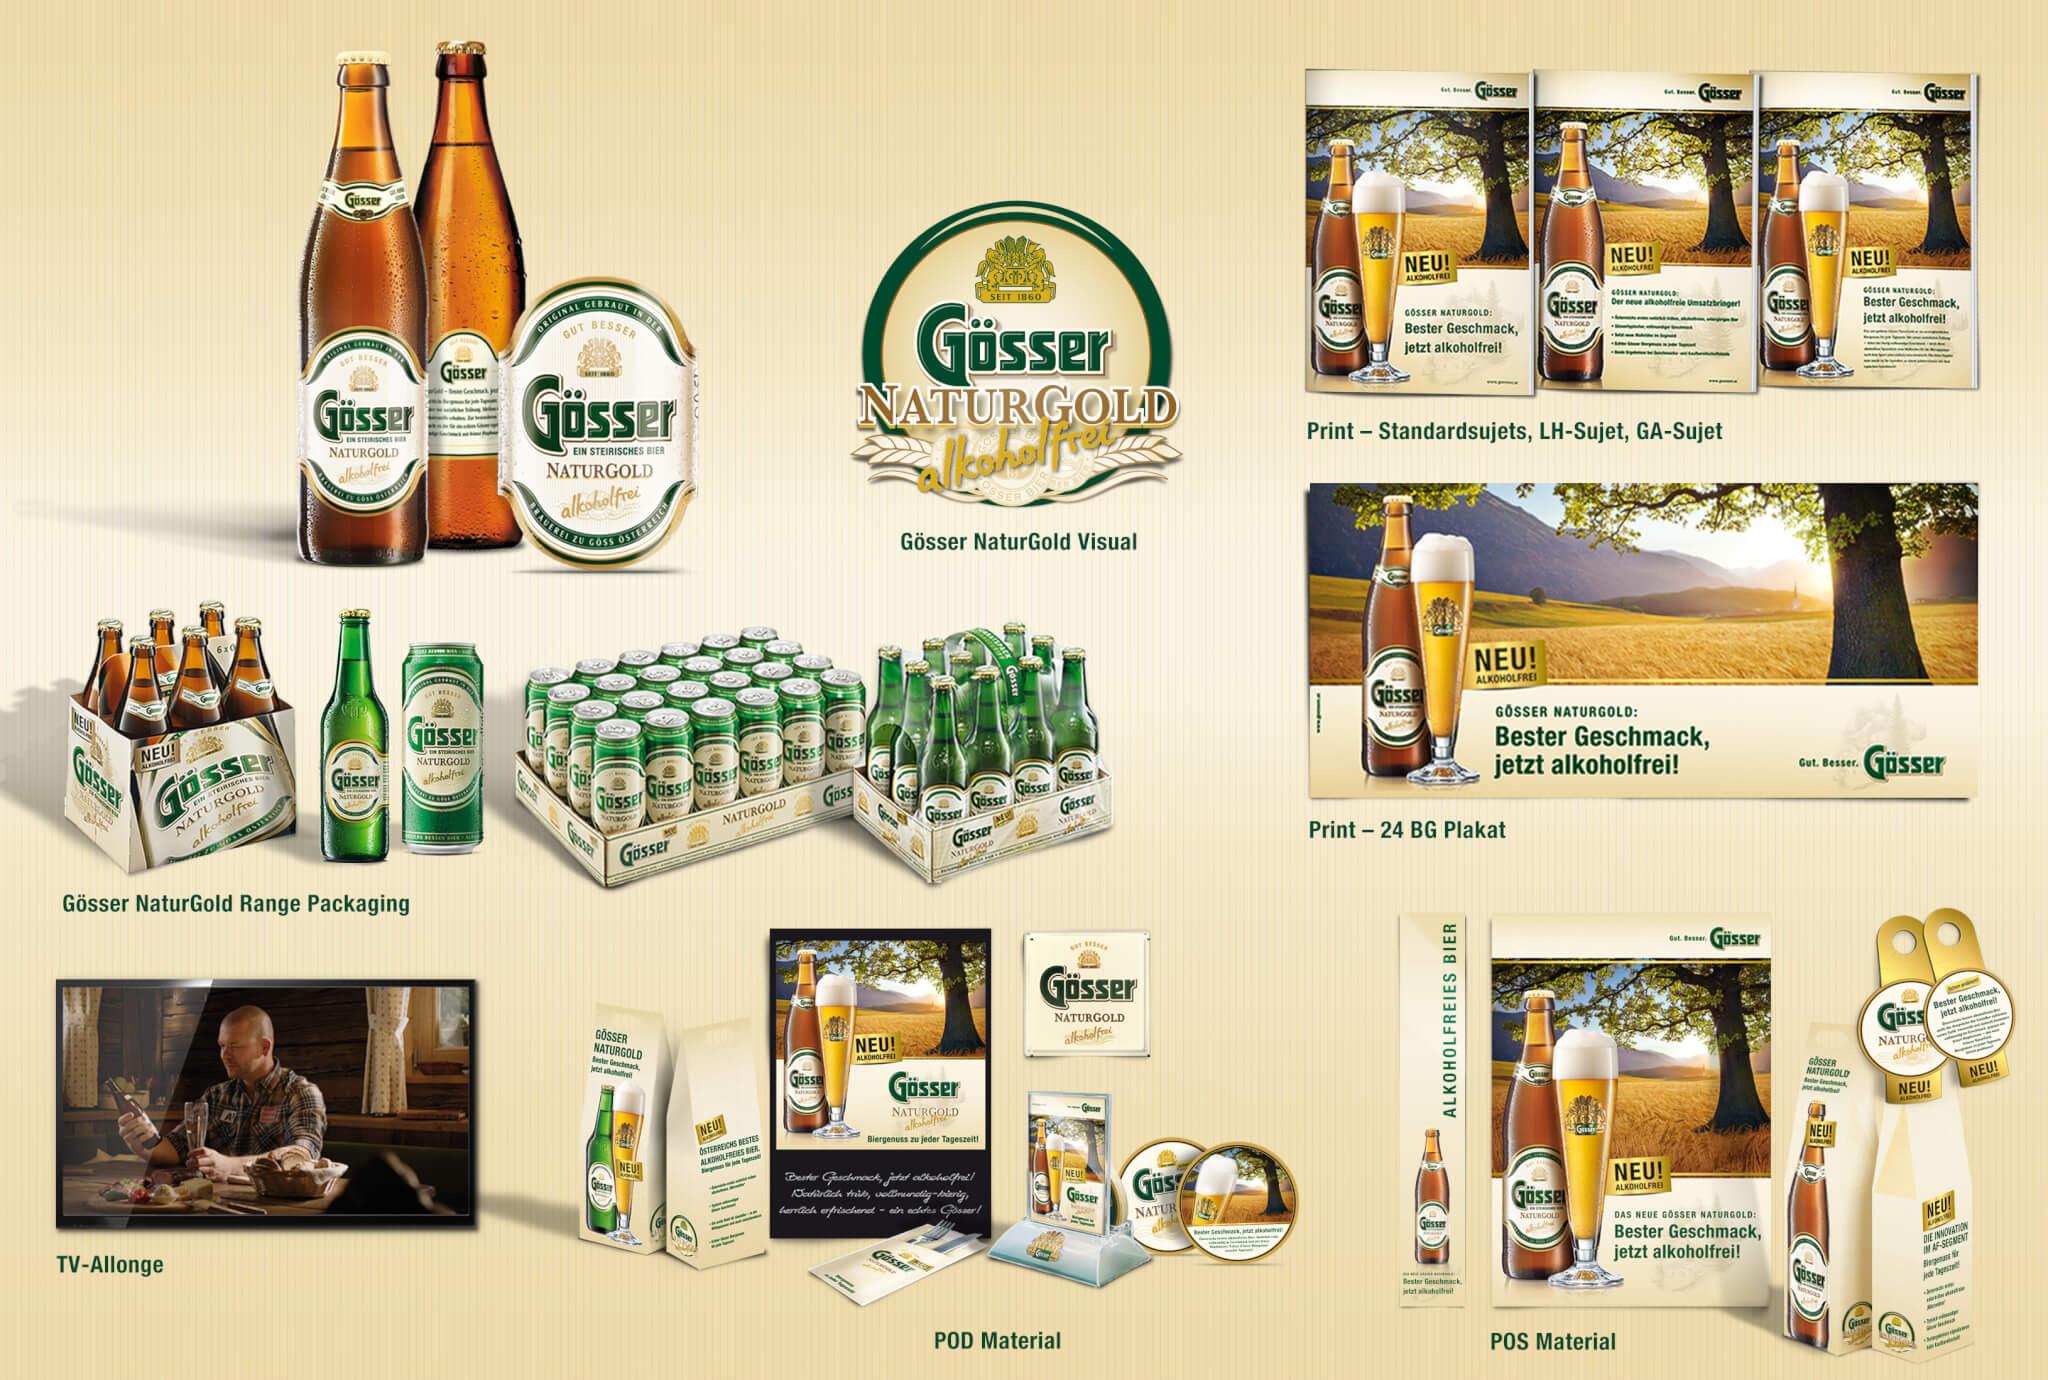 Gösser NaturGold – das erste alkoholfreie Gösser